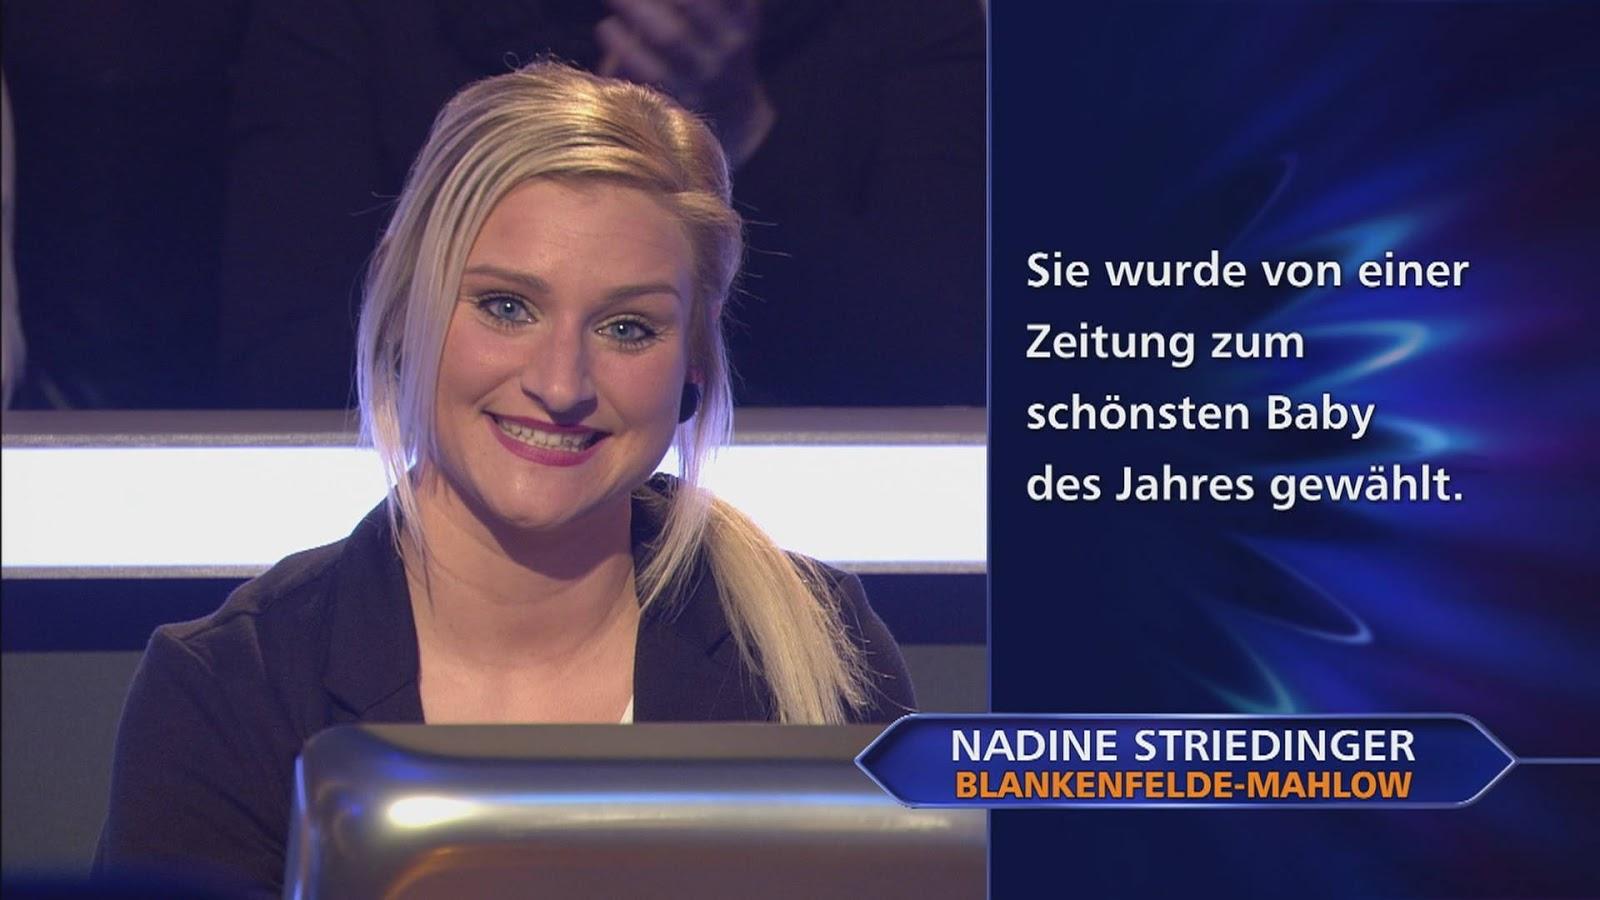 Nadine Striedinger